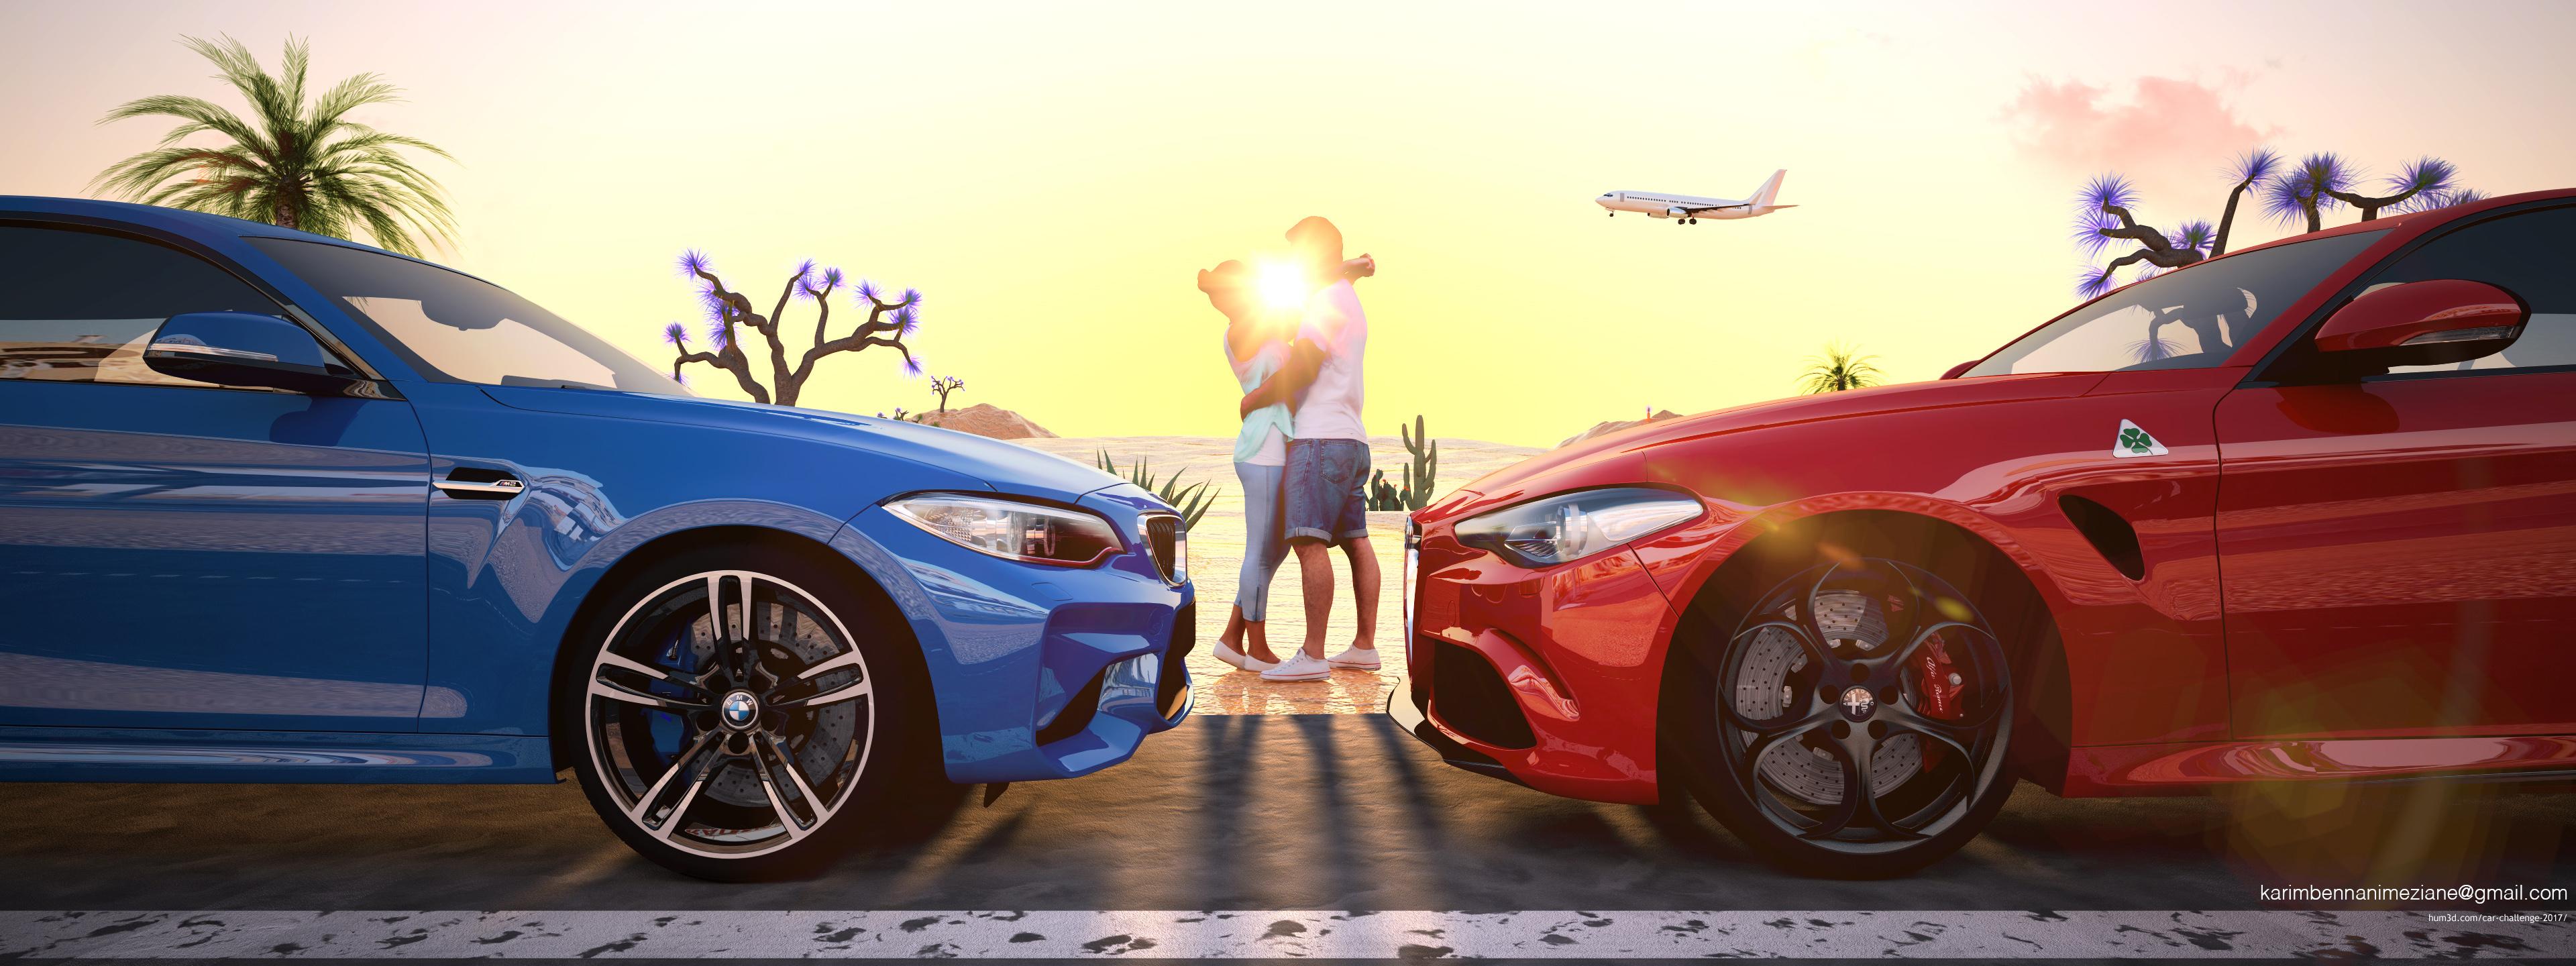 Passion creates Love 3d art